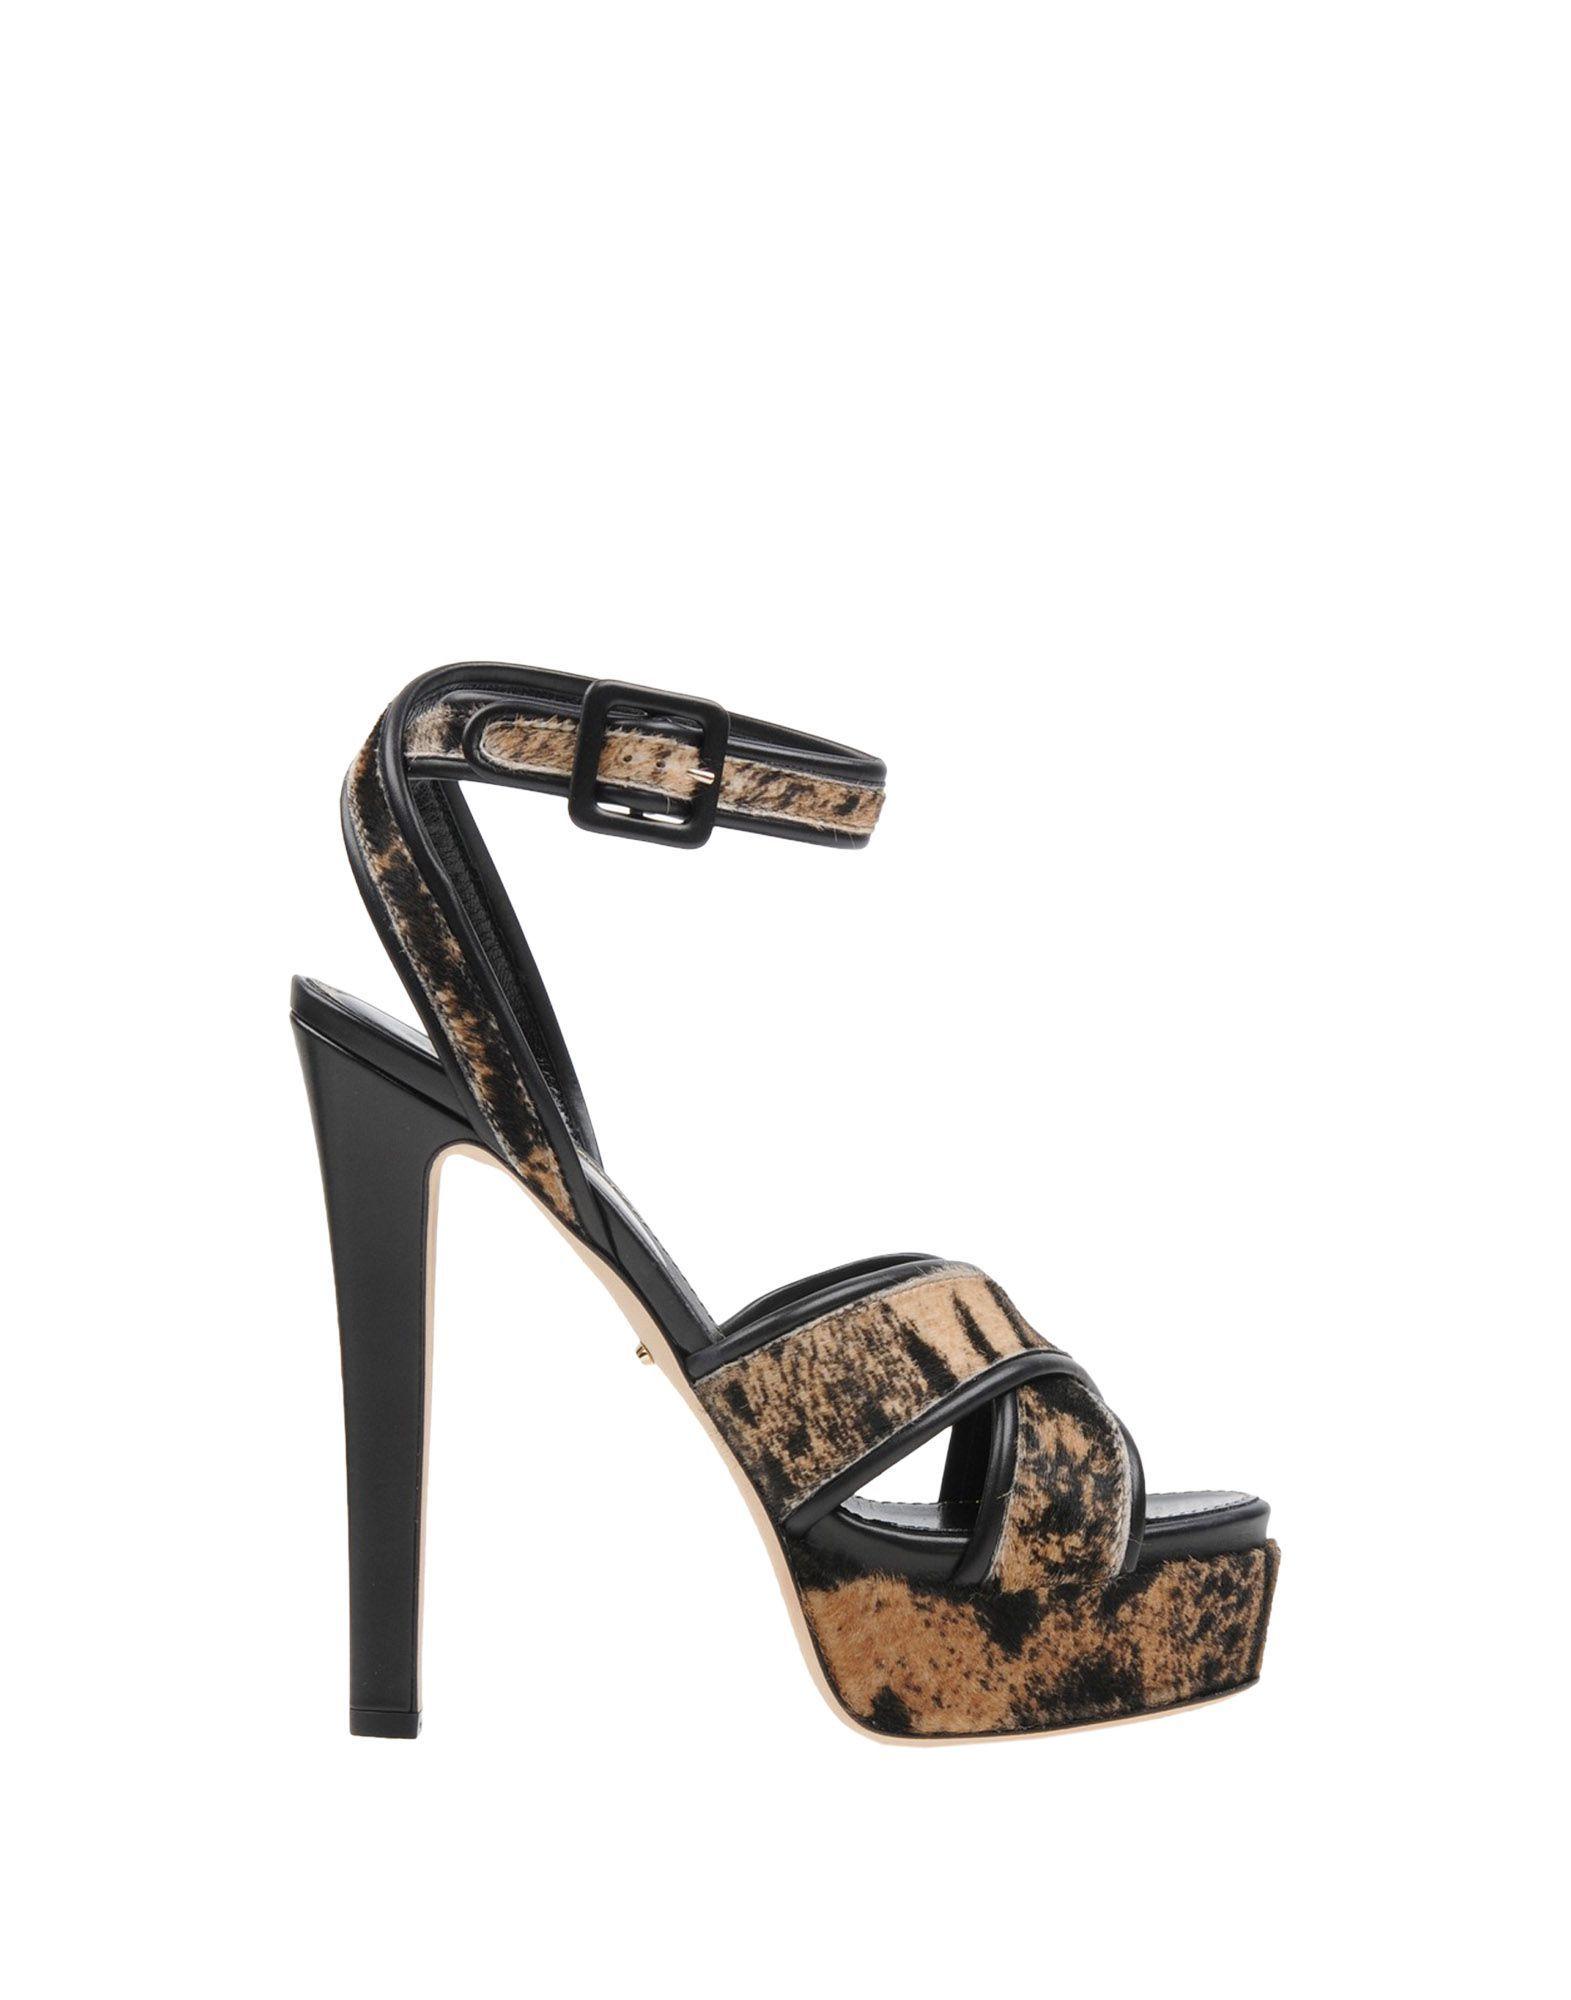 Sergio Rossi Sand Print Leather Heeled Sandals